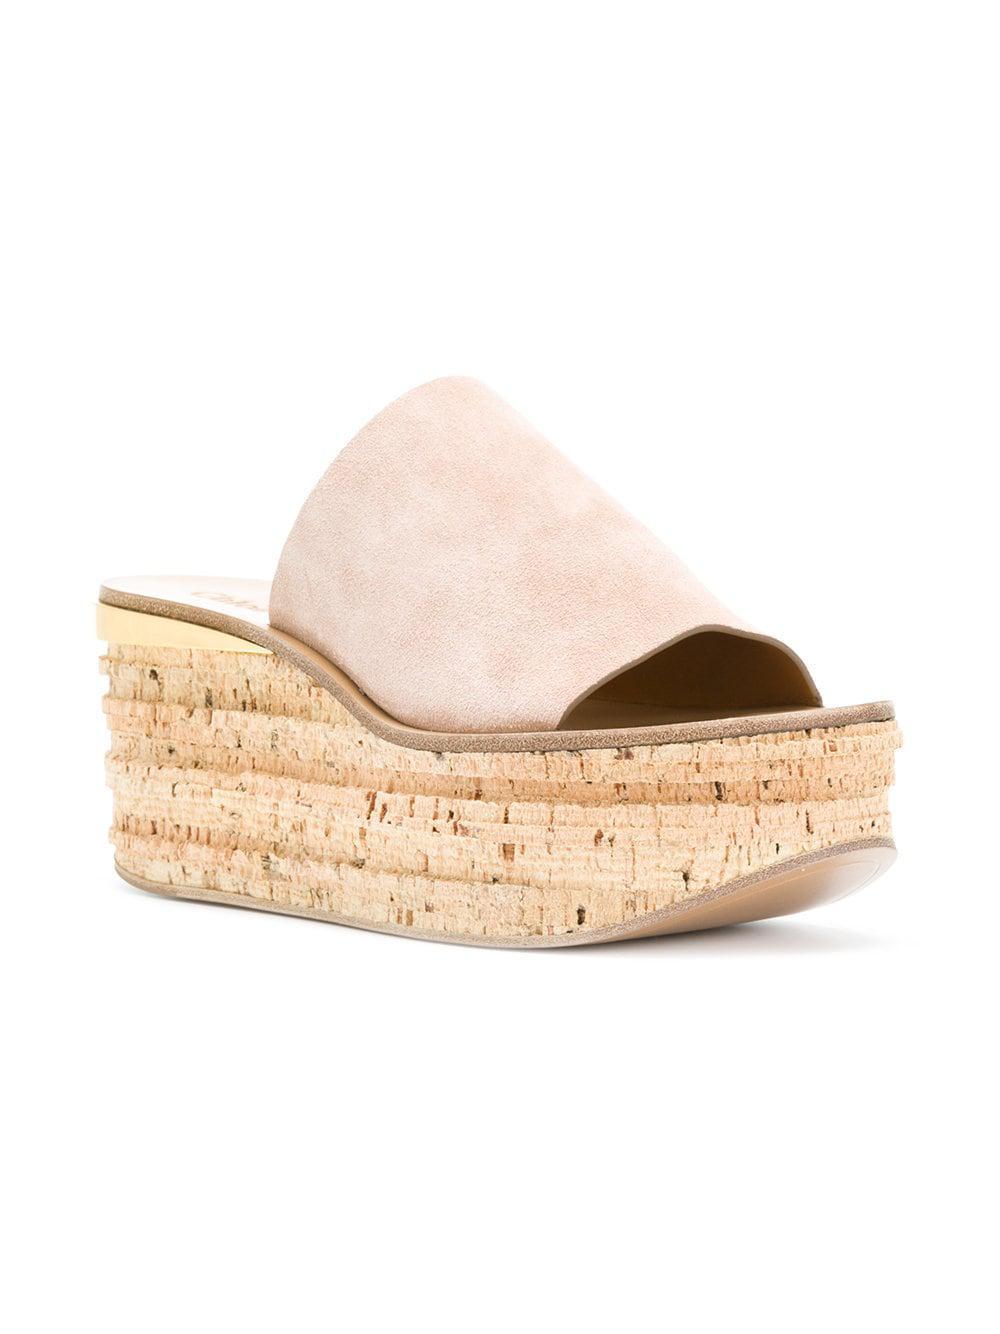 1a2ed5a15d76 Chloé - Pink Camille Suede Platform Sandals - Lyst. View fullscreen